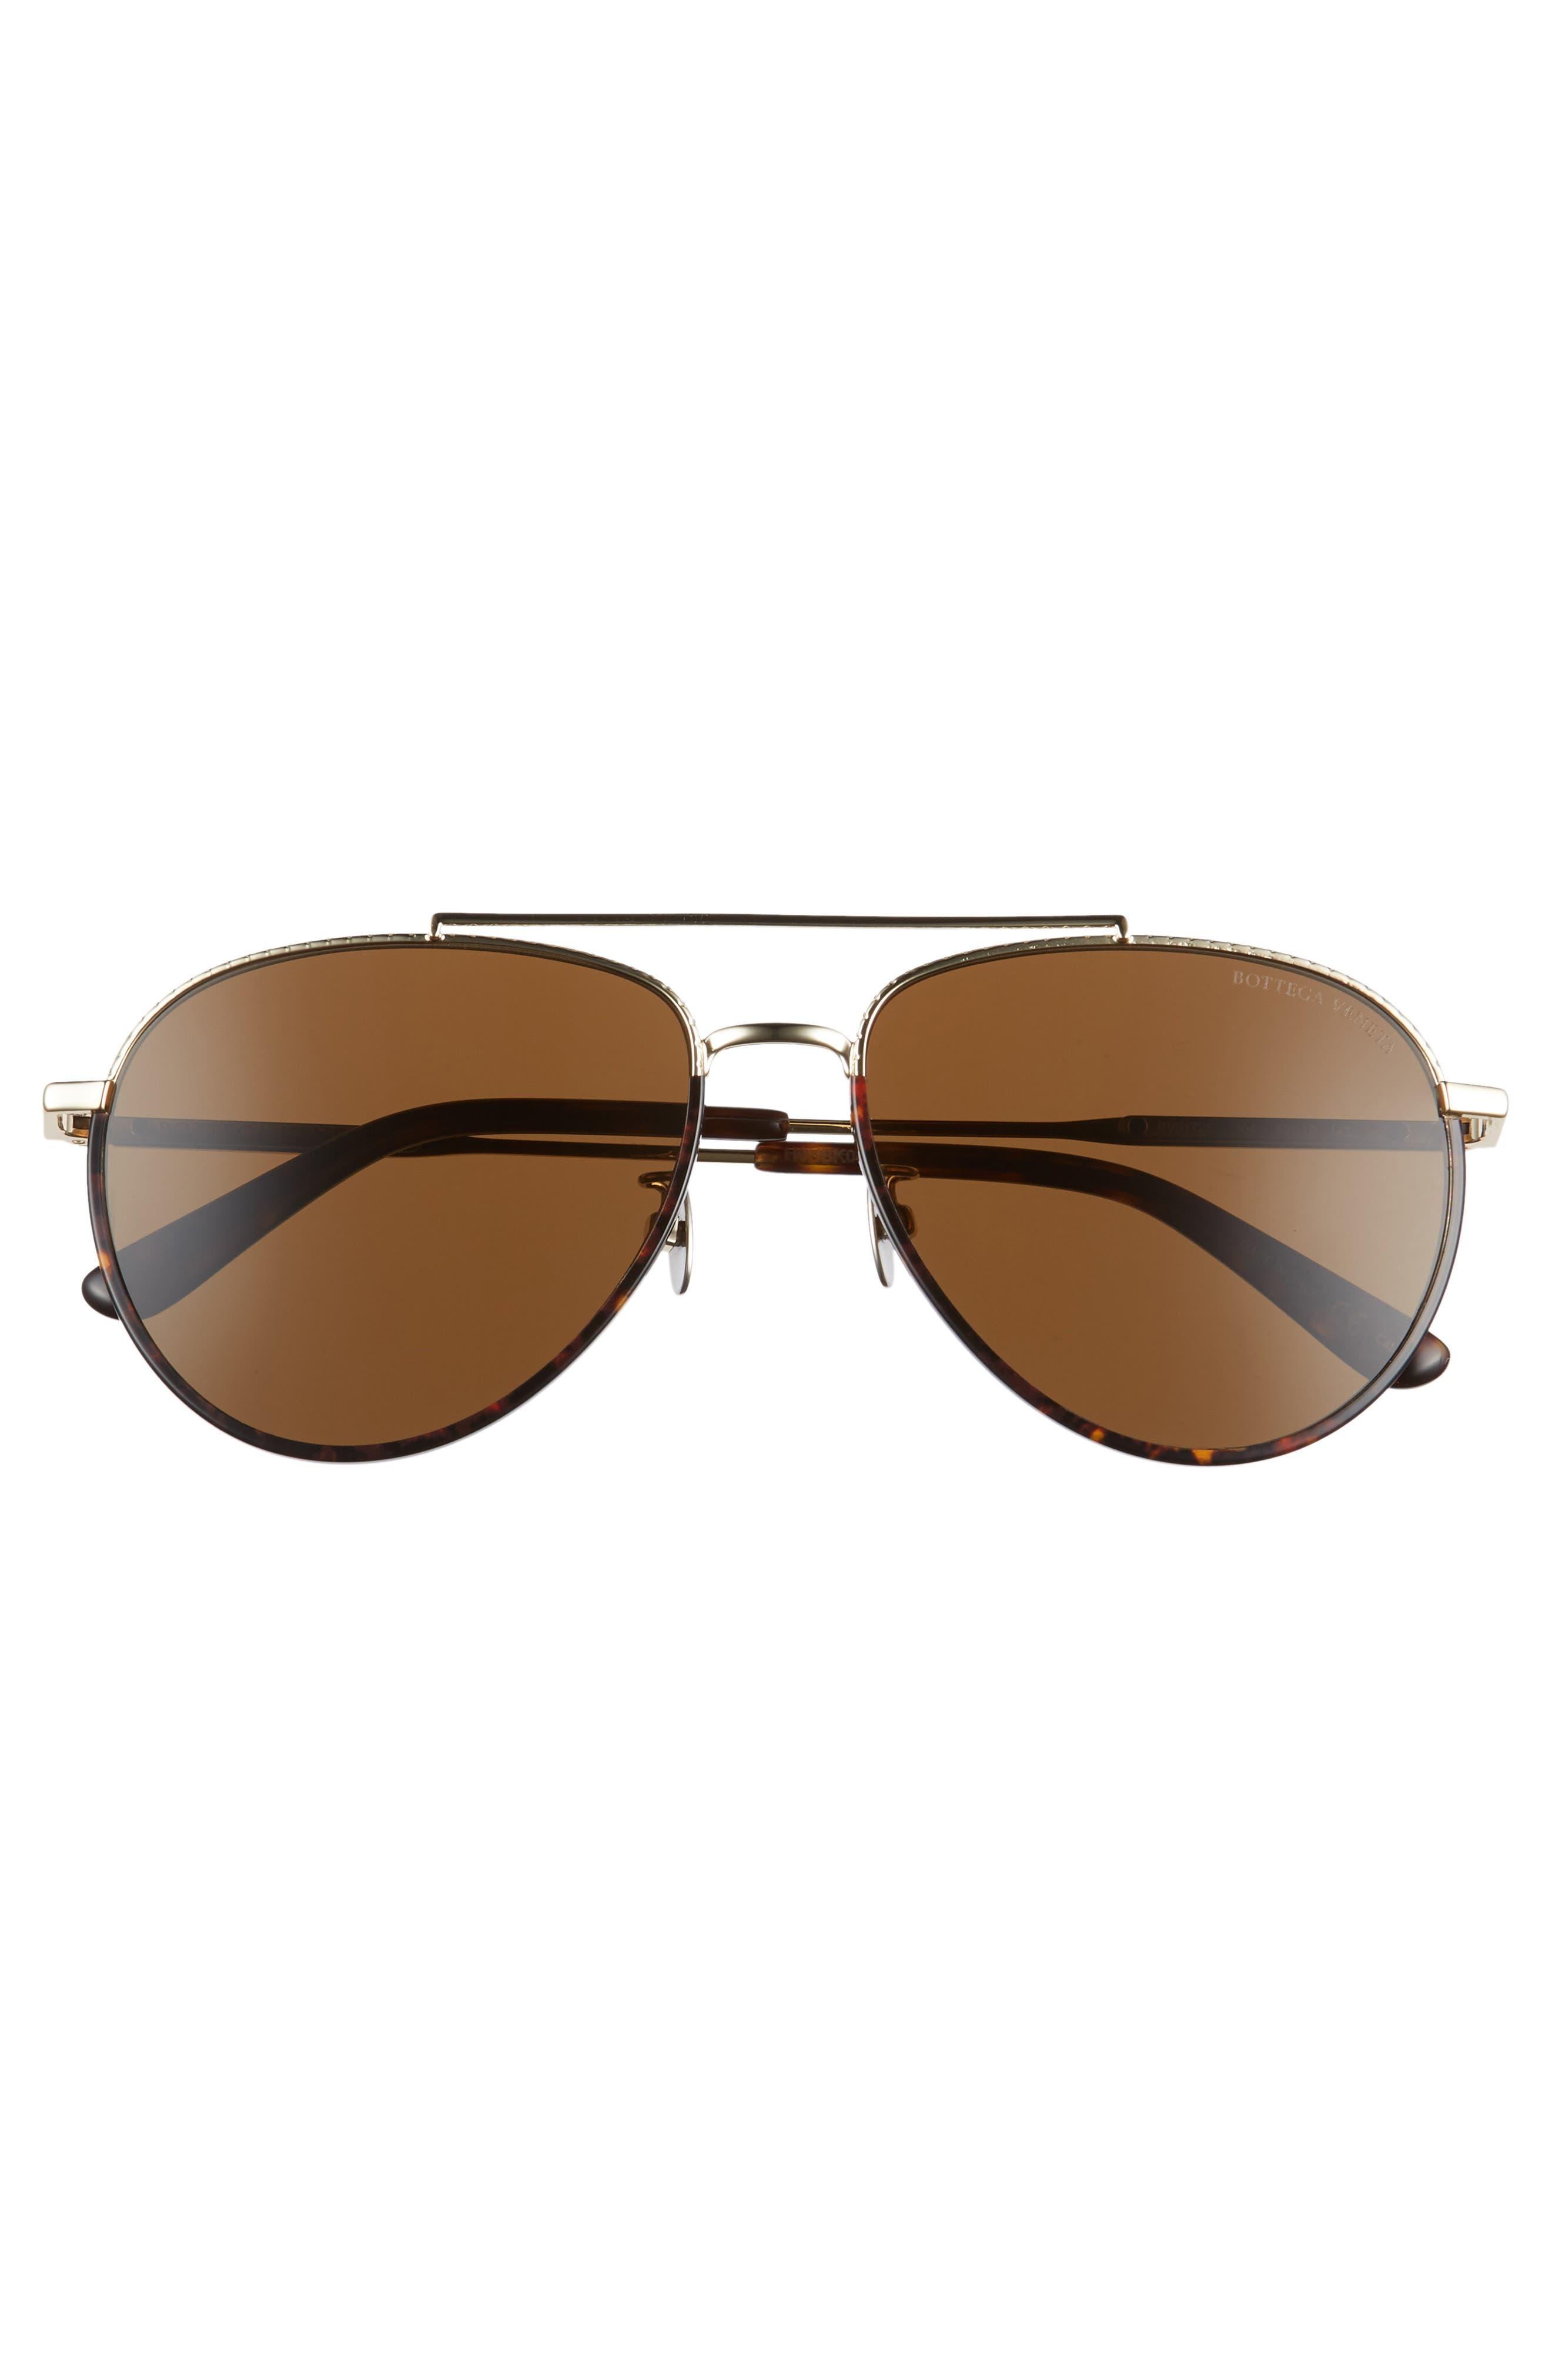 59mm Aviator Sunglasses,                             Alternate thumbnail 6, color,